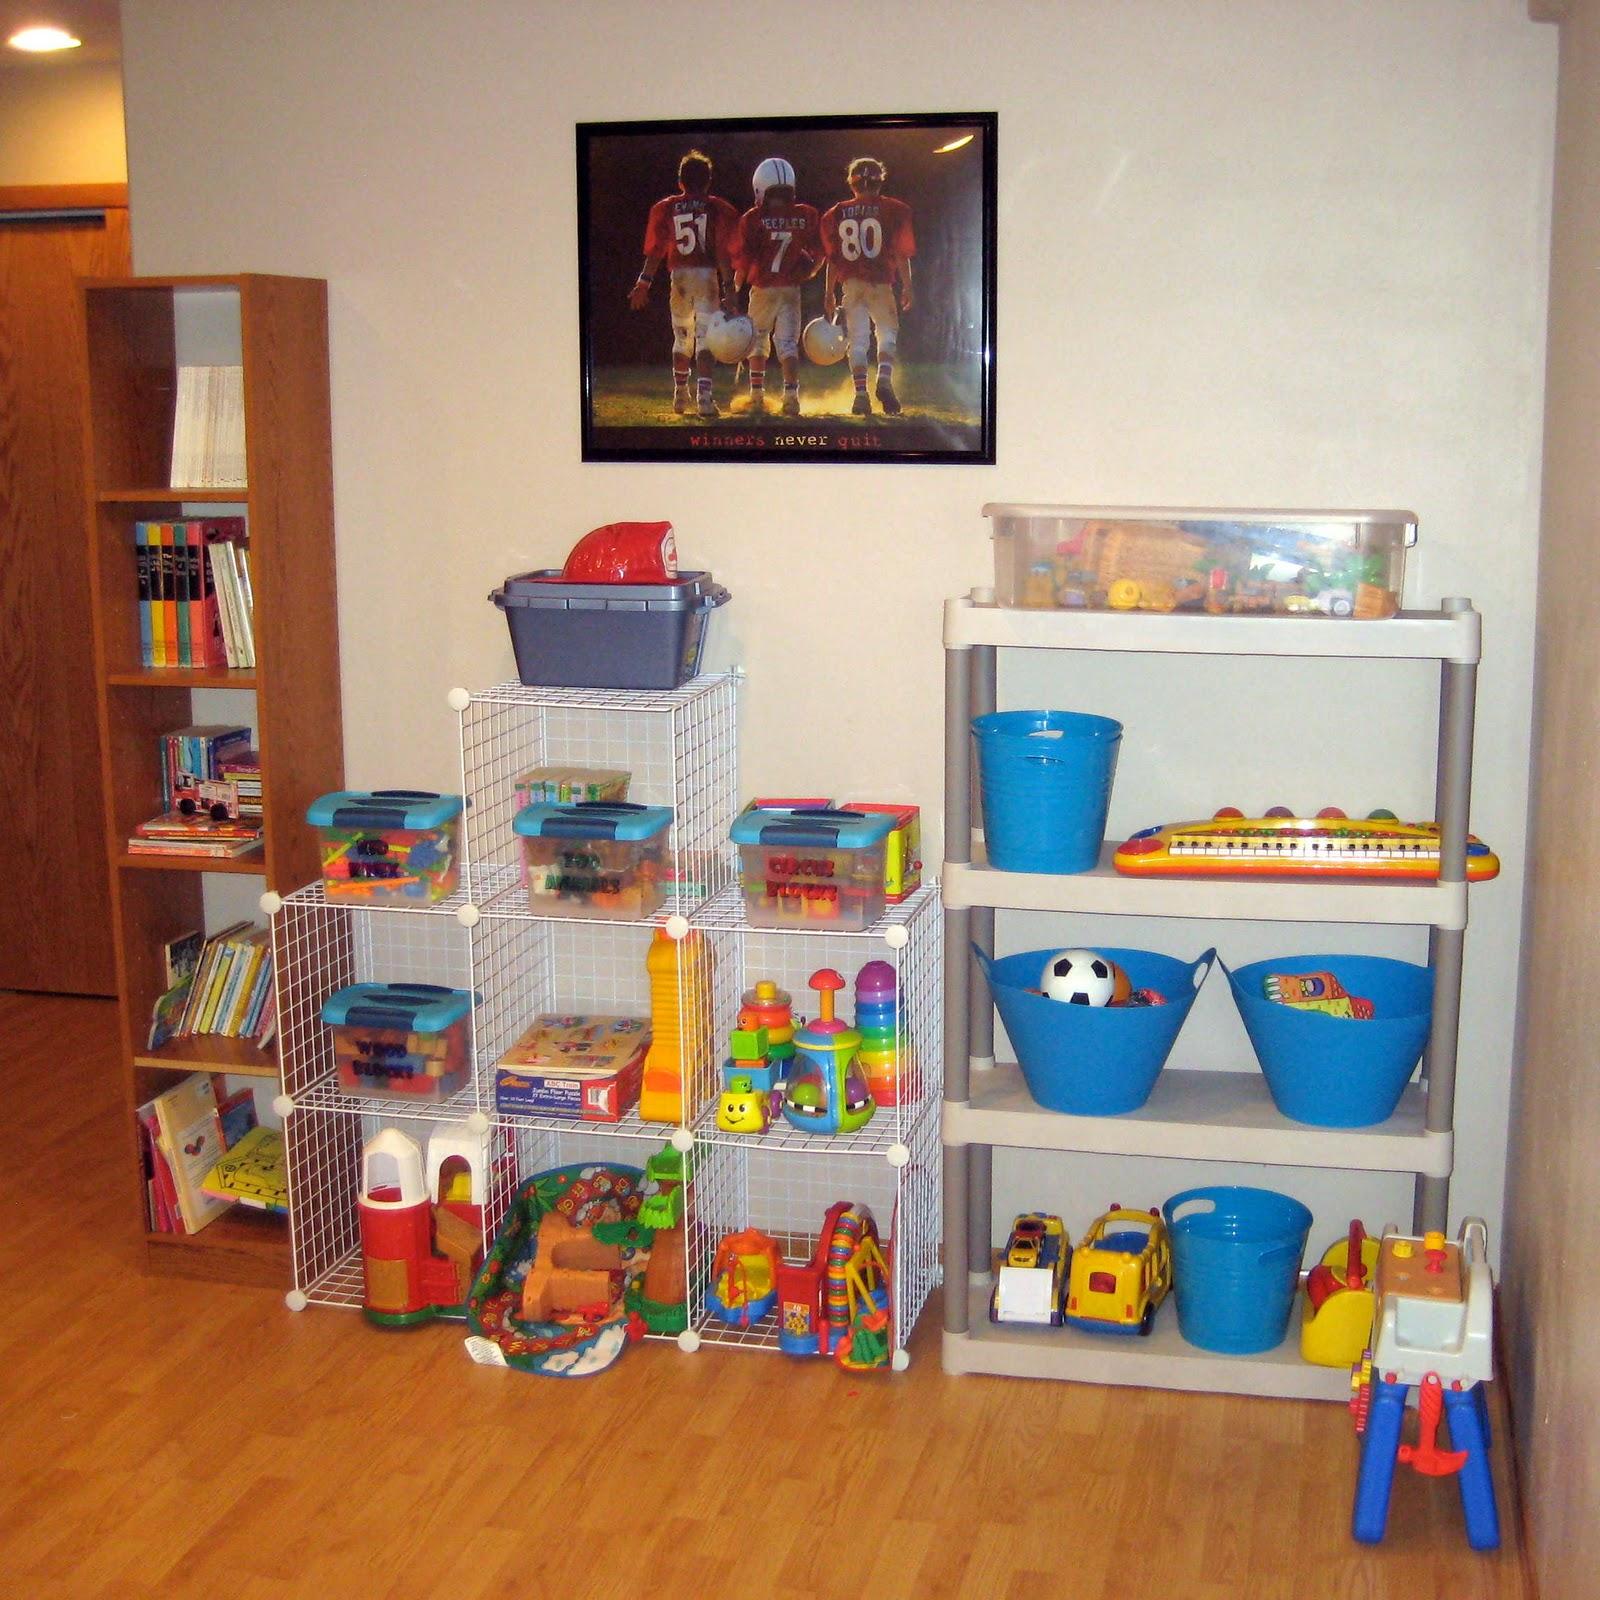 Organizing Toy Room Ideas Pictures | Joy Studio Design ...